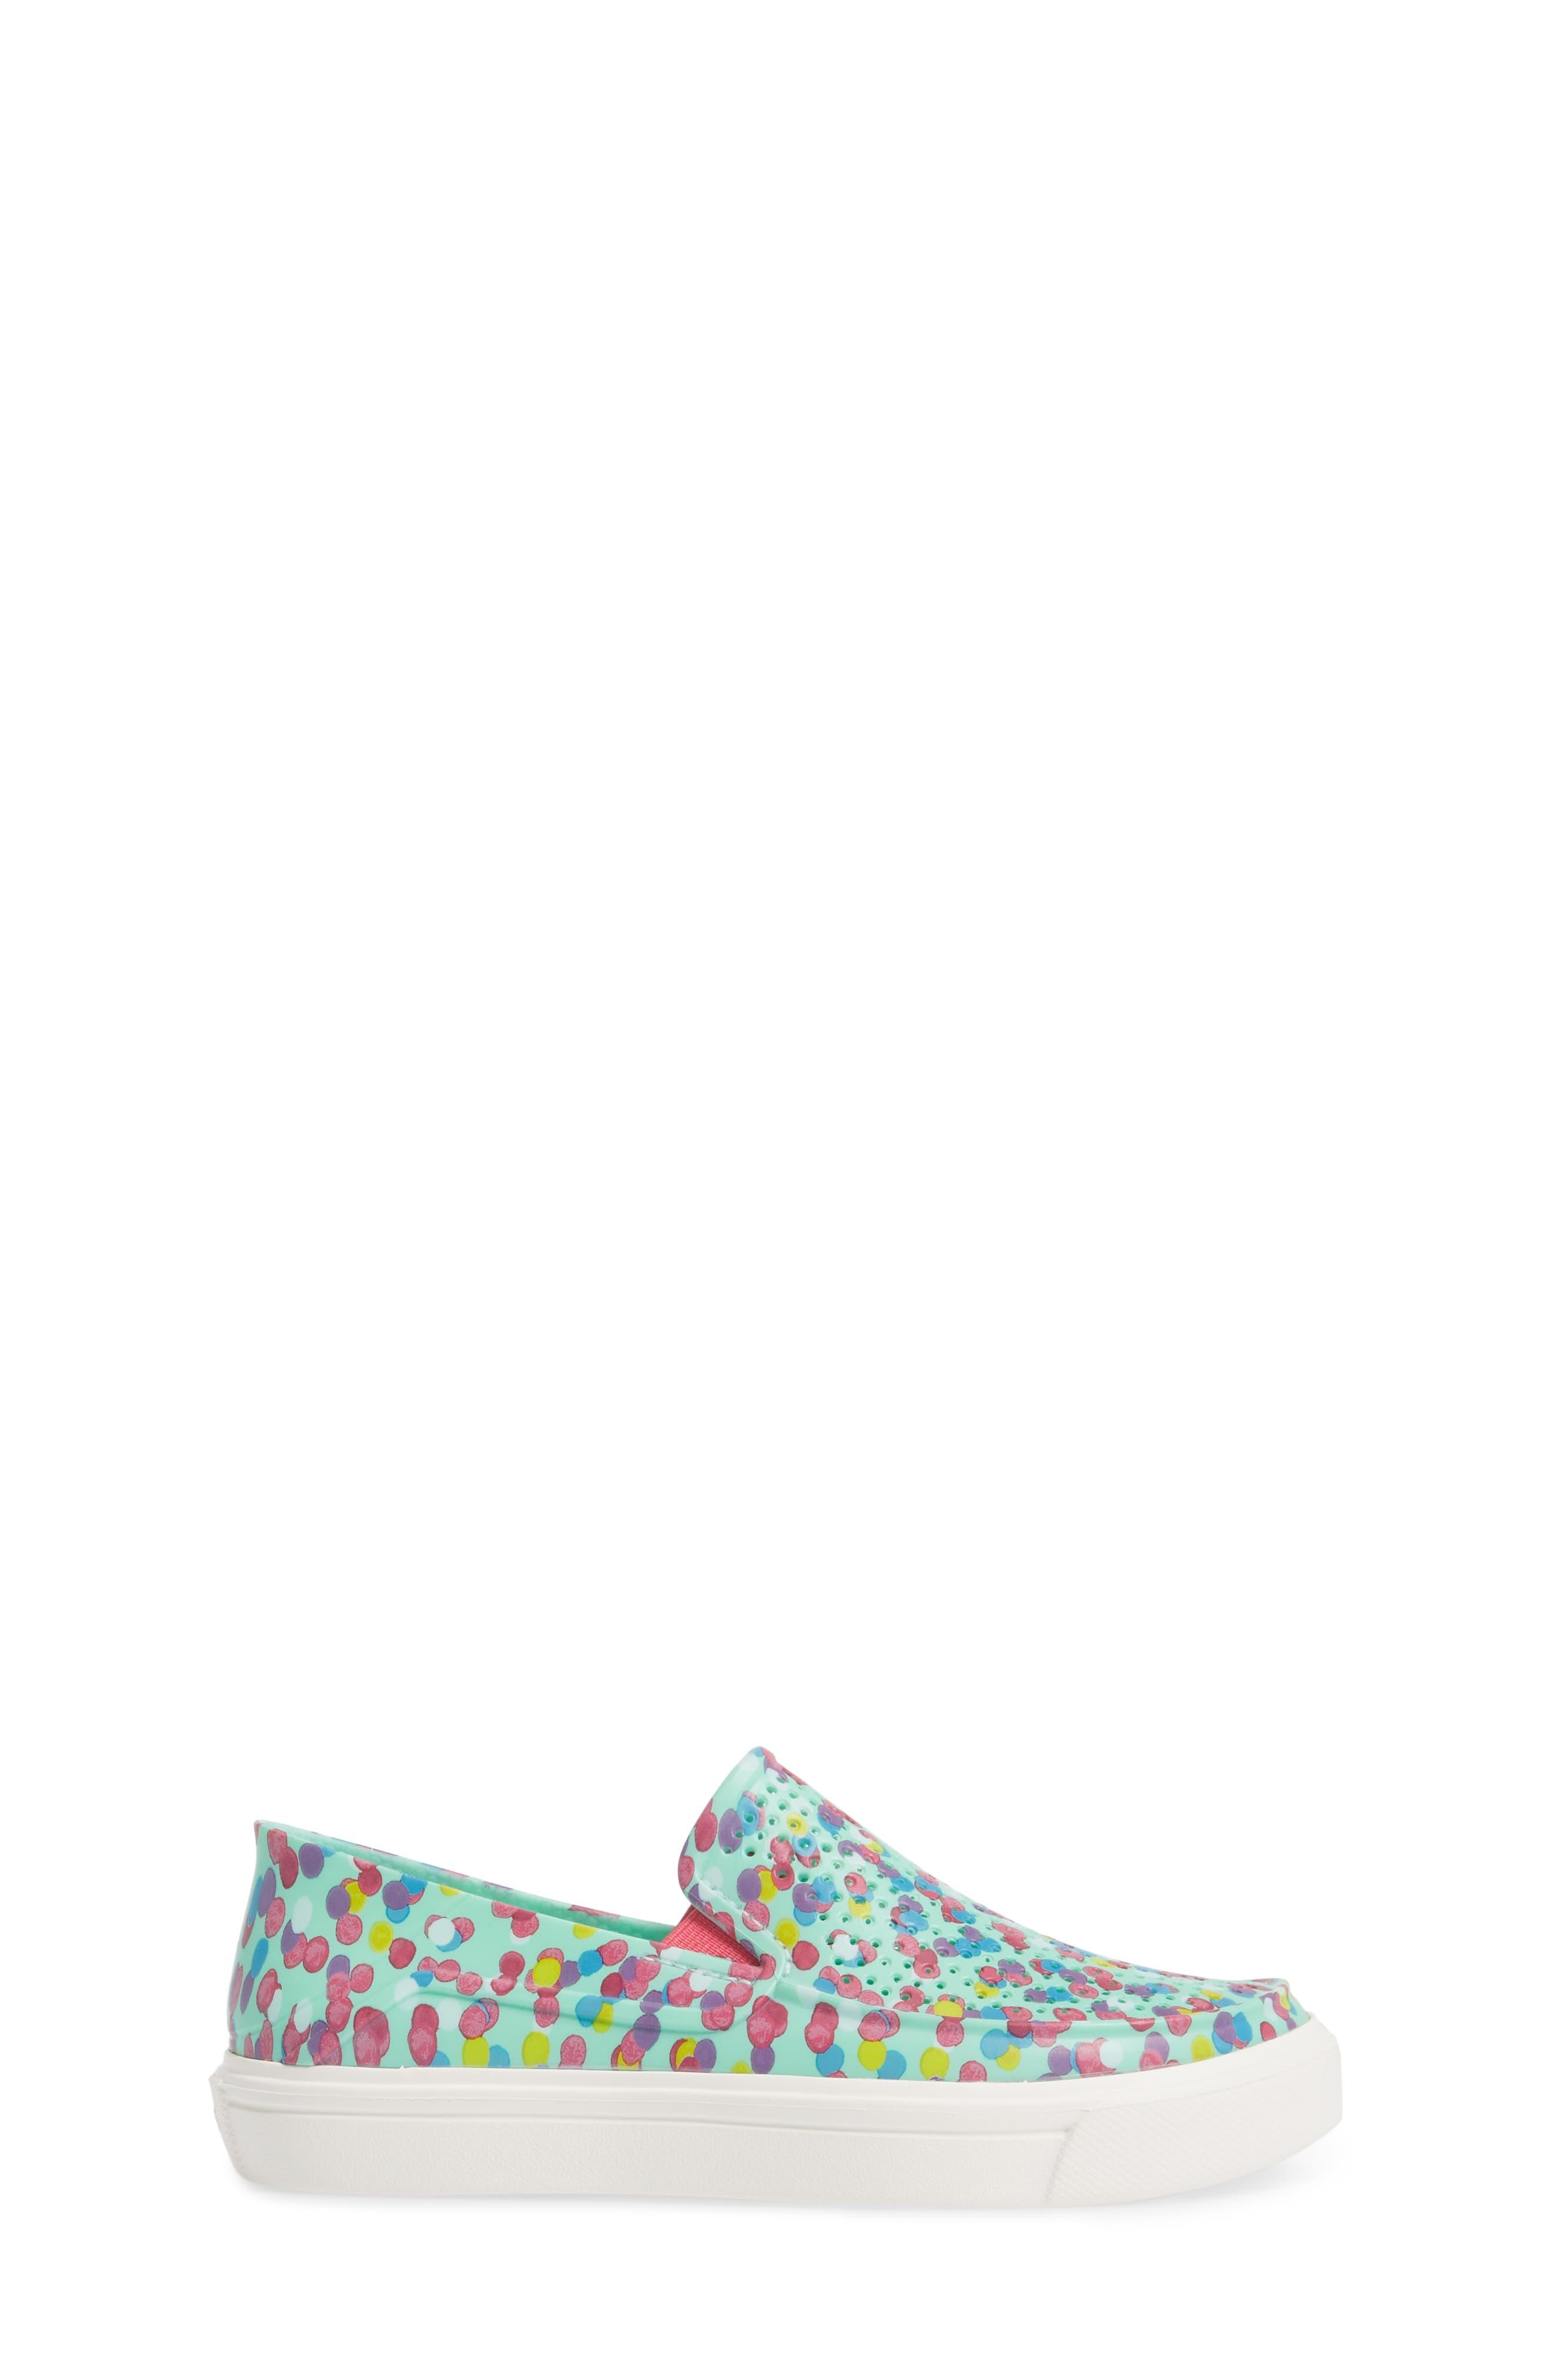 CitiLane Roka Graphic Slip-On Sneaker,                             Alternate thumbnail 3, color,                             Multi/ Mint